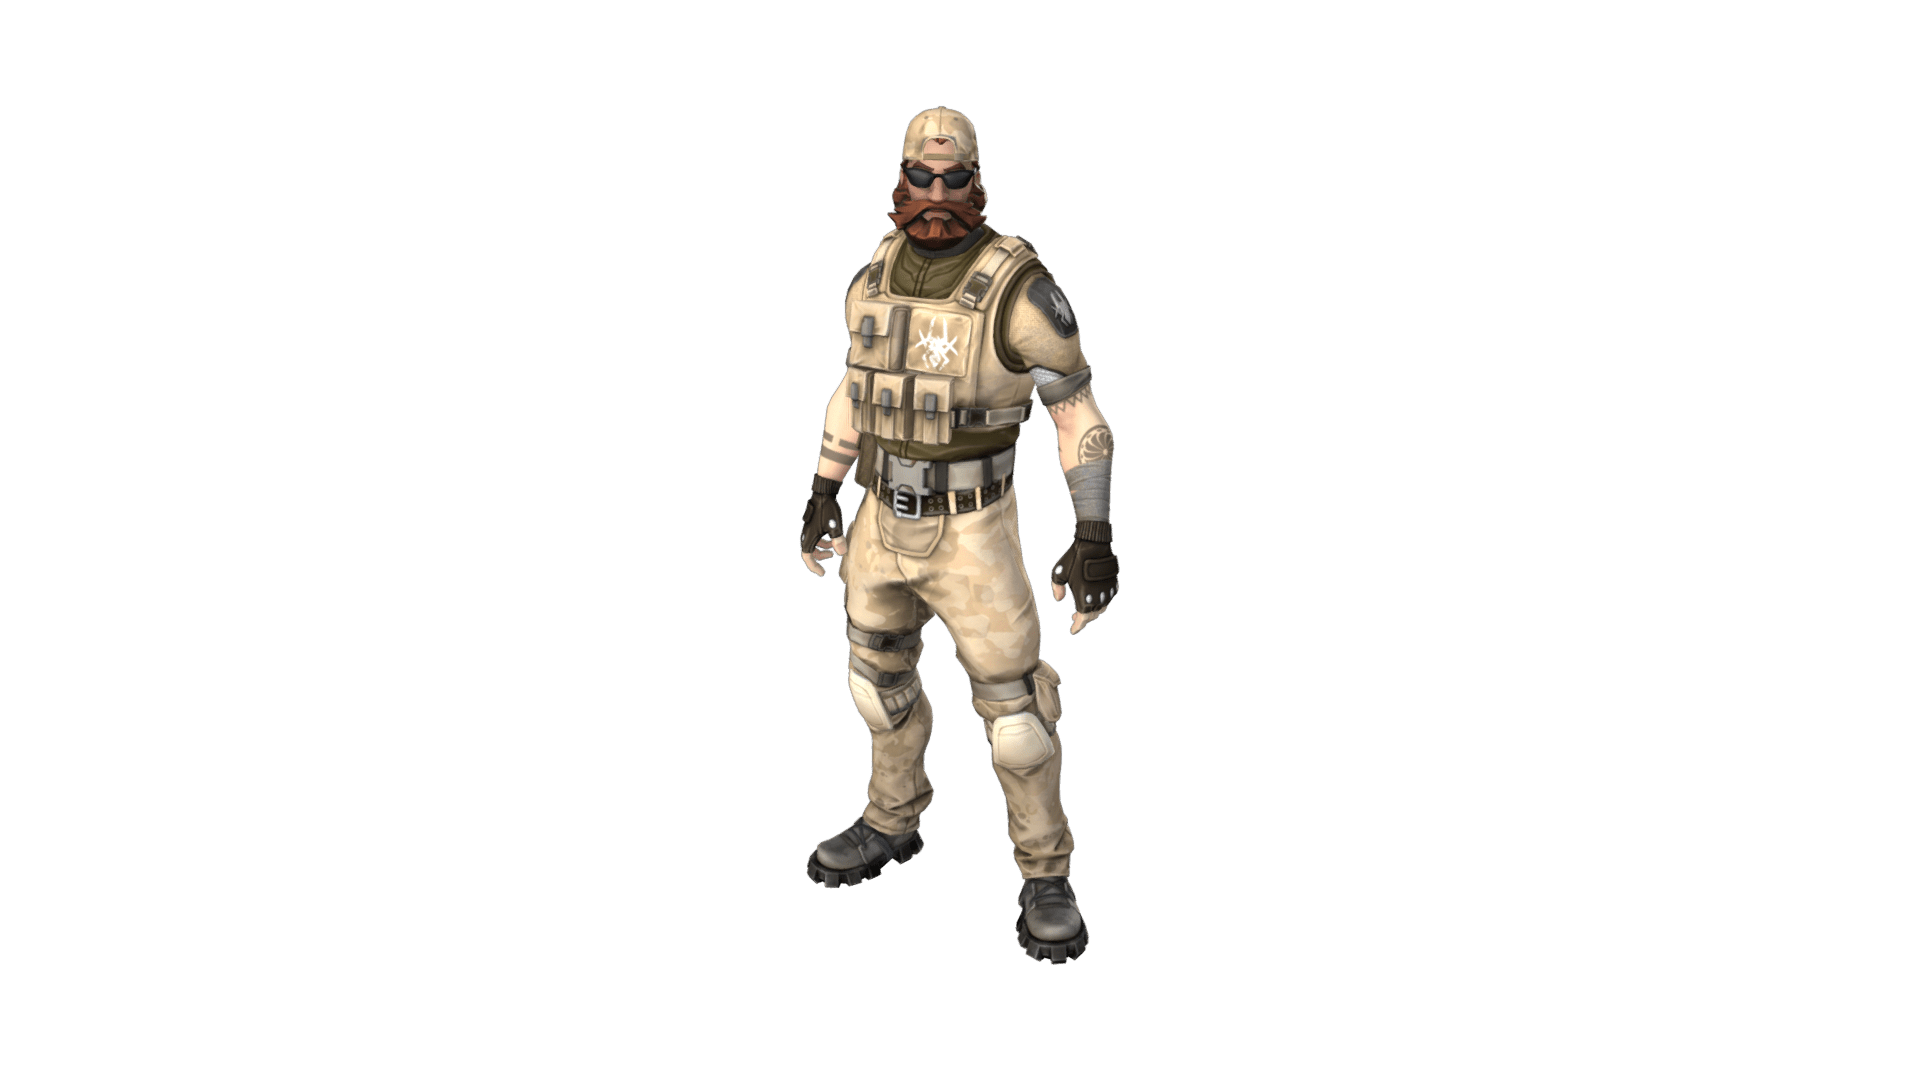 Fortnite Sledgehammer Outfits   Fortnite Skins 1920x1080